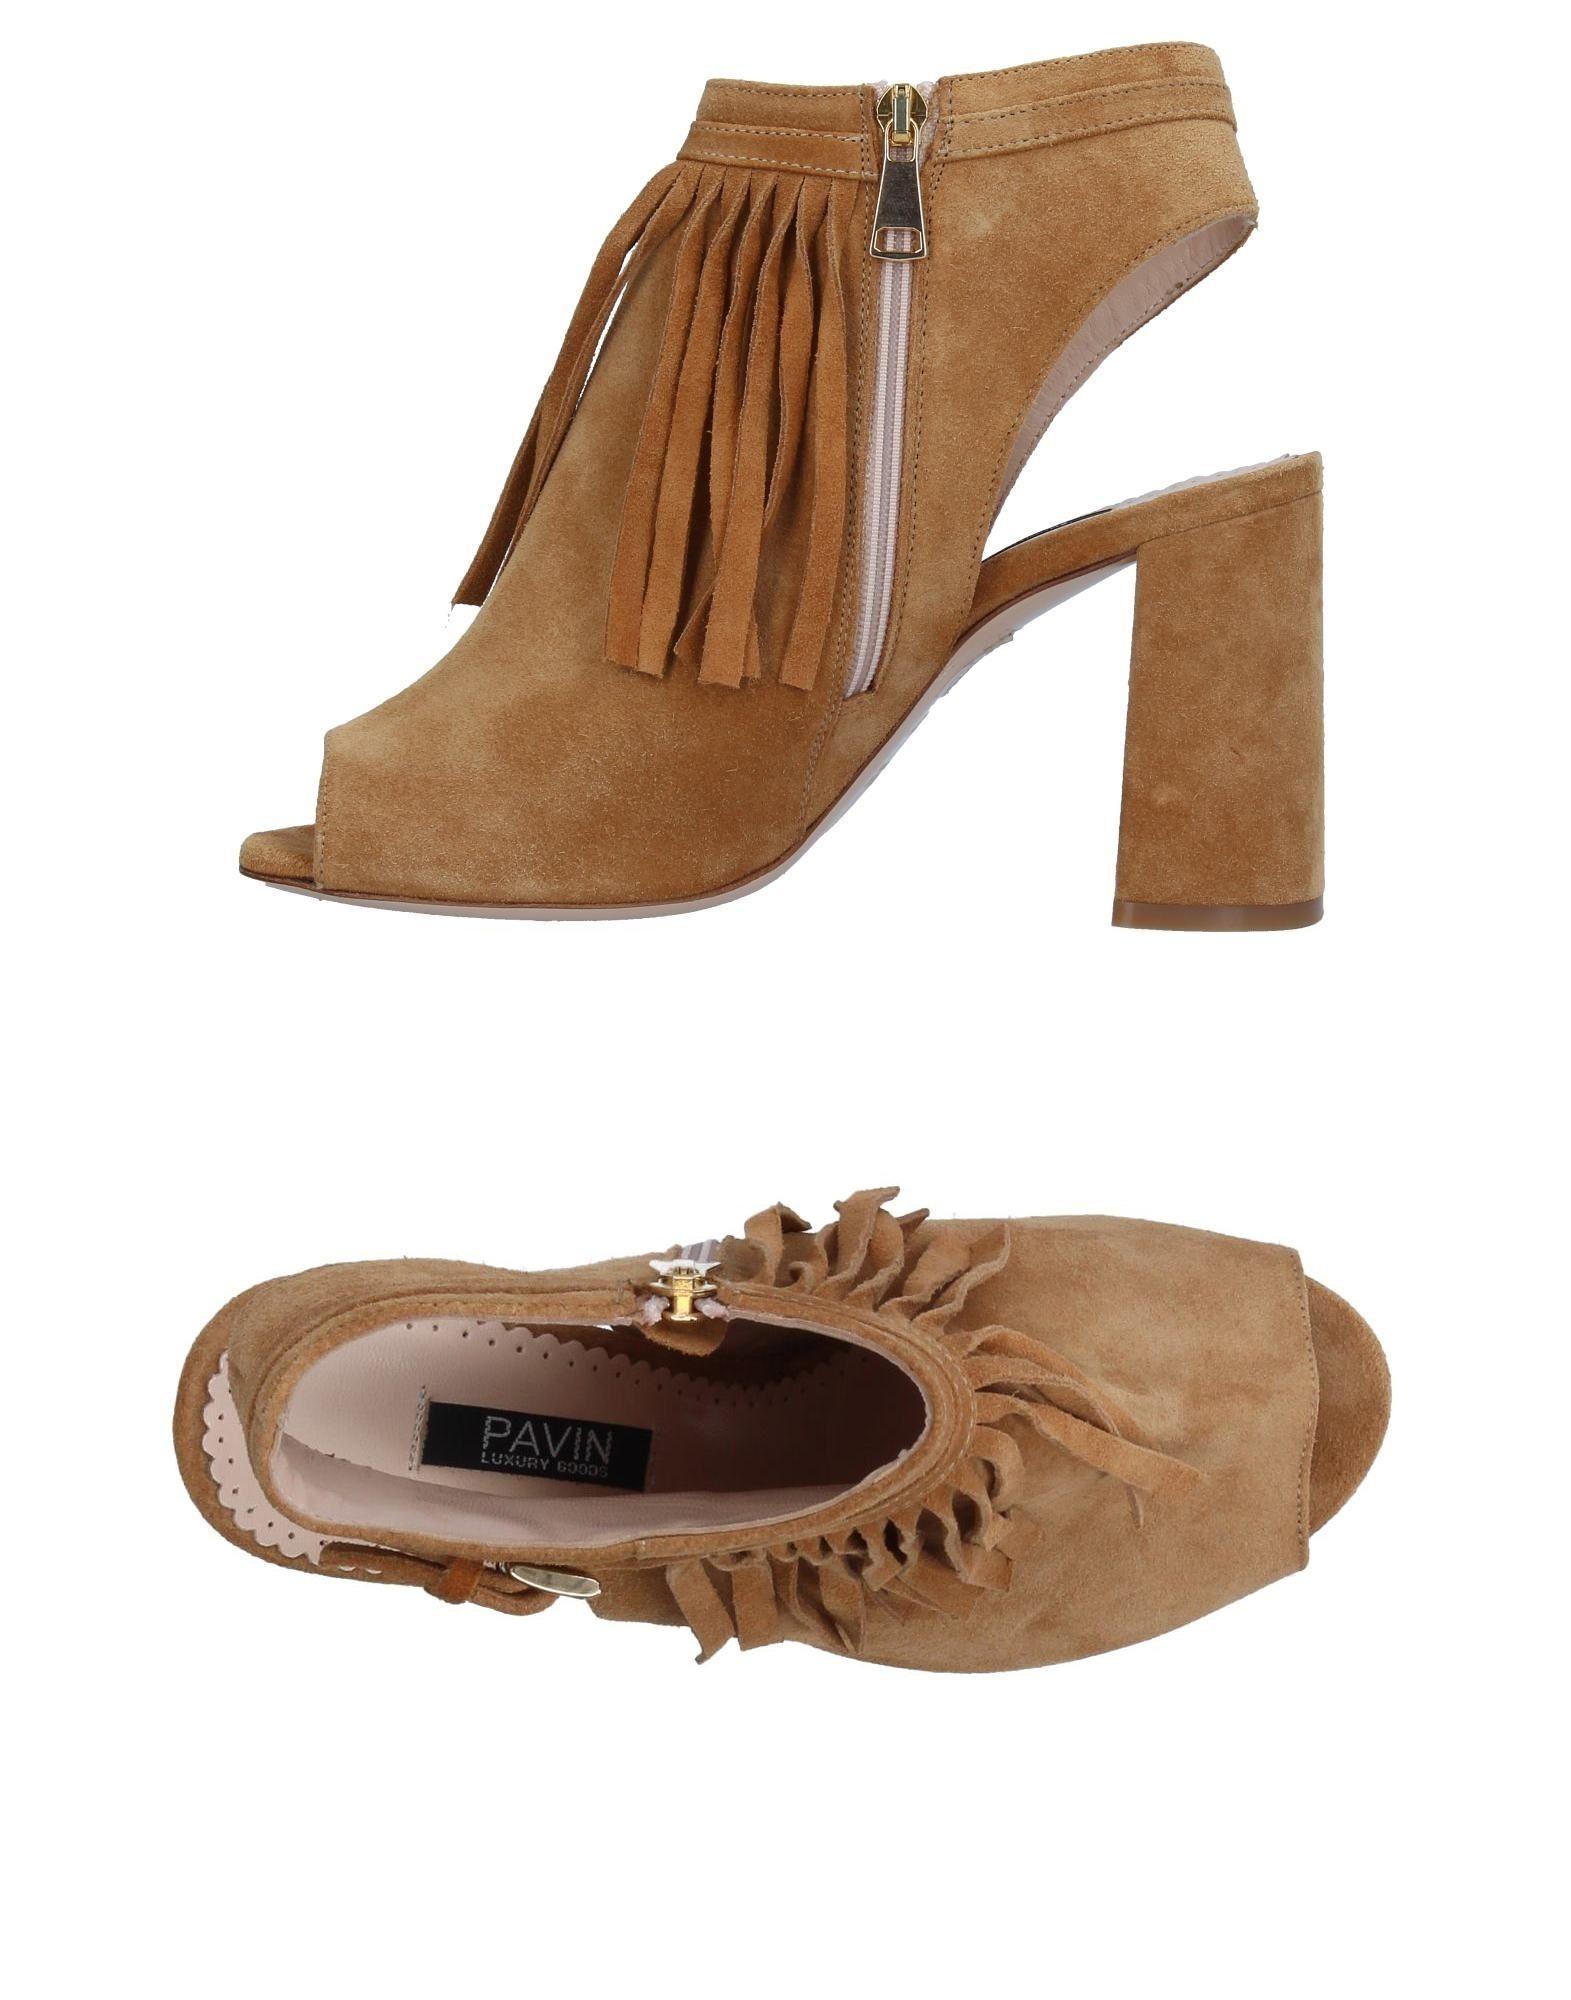 Pavin Sandalen Damen   Damen 11368242AC Gute Qualität beliebte Schuhe ddfe9c